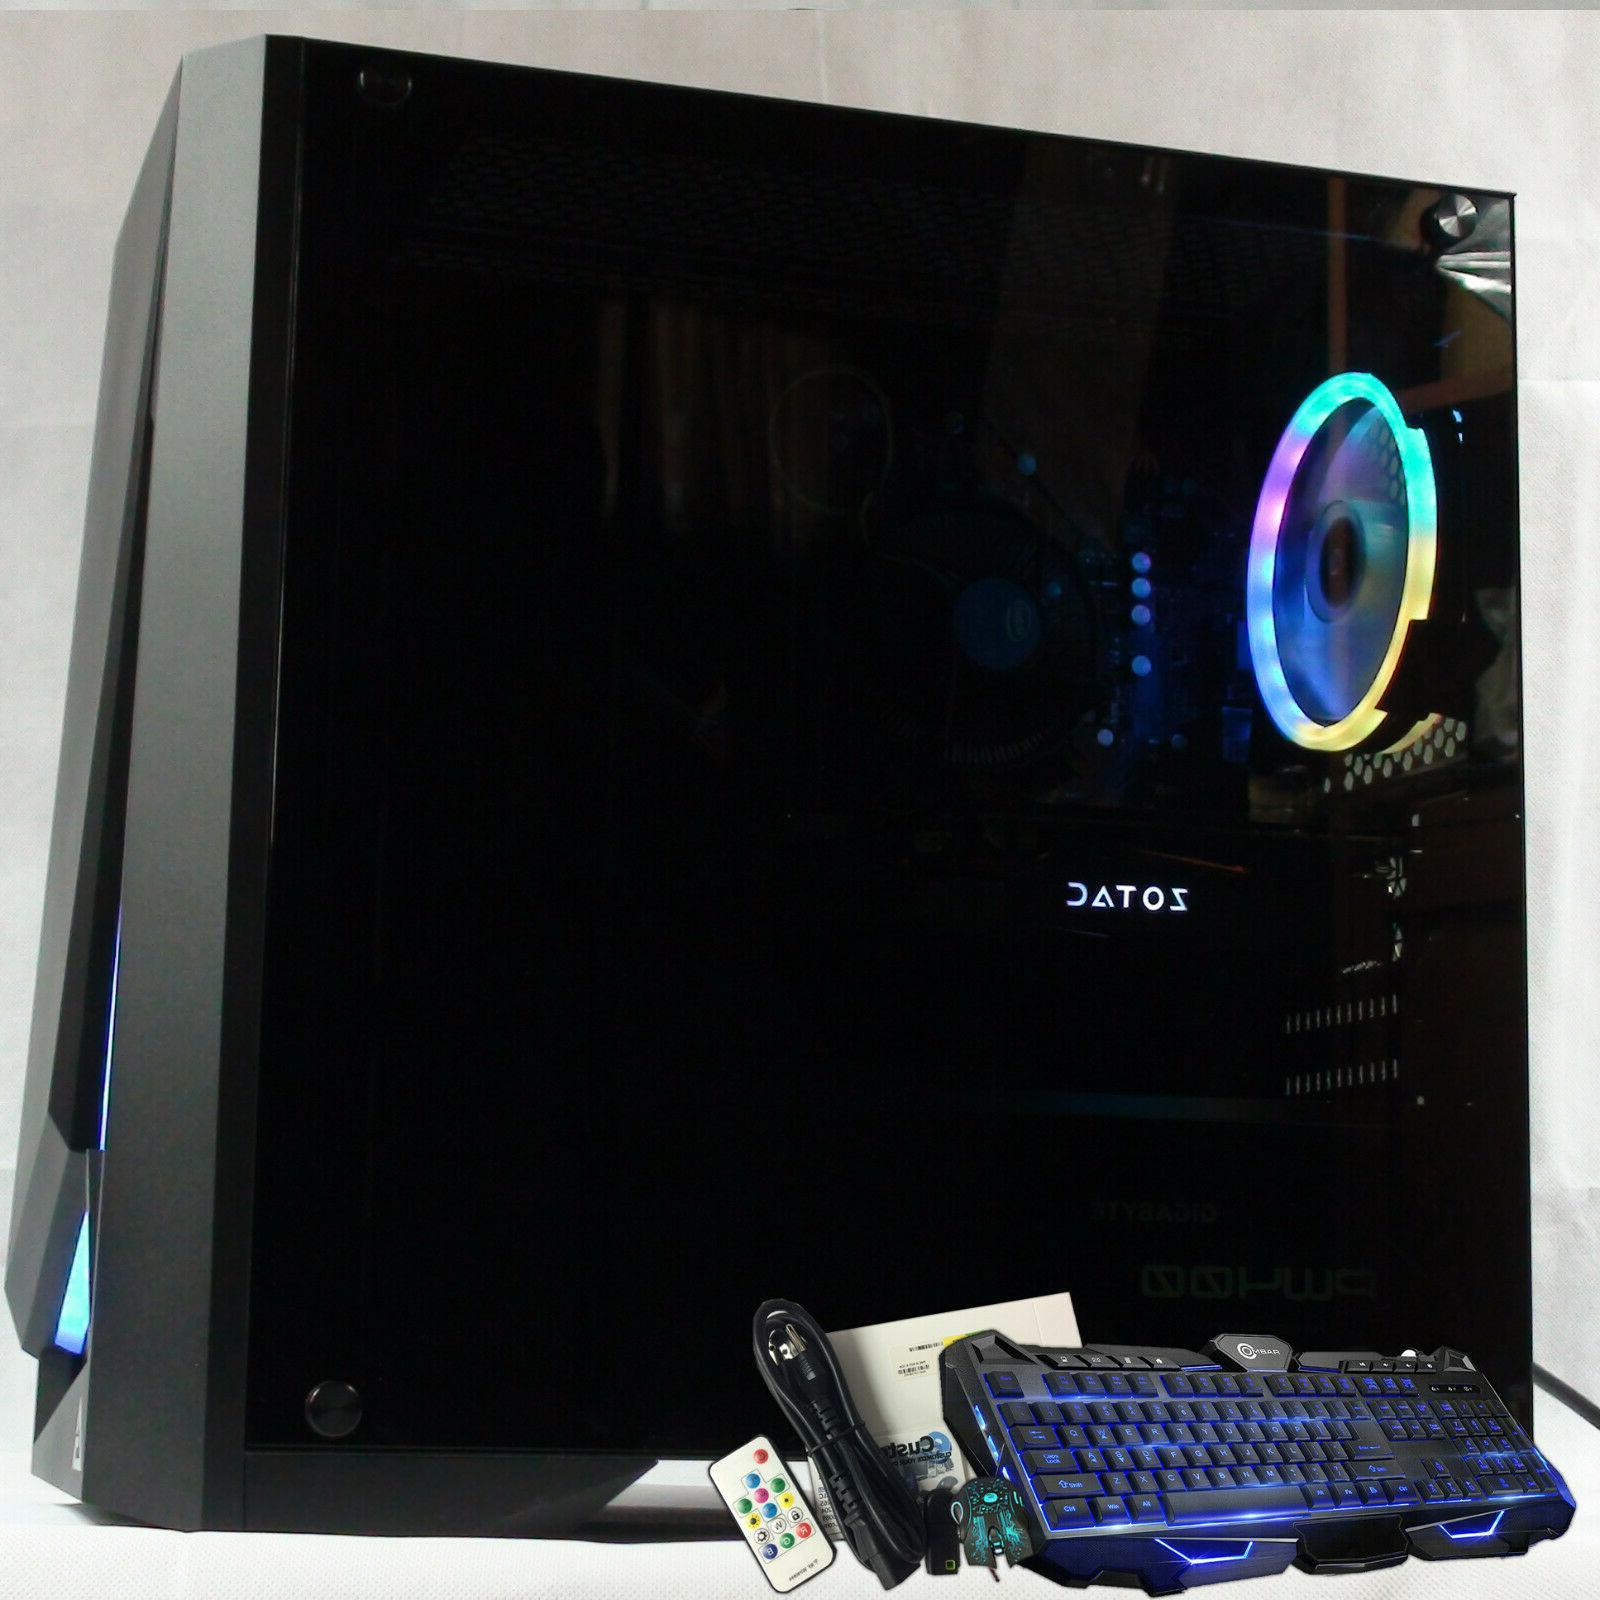 Intel i9-9900K Gaming Computer 2TB 16GB GeForce GTX 1080